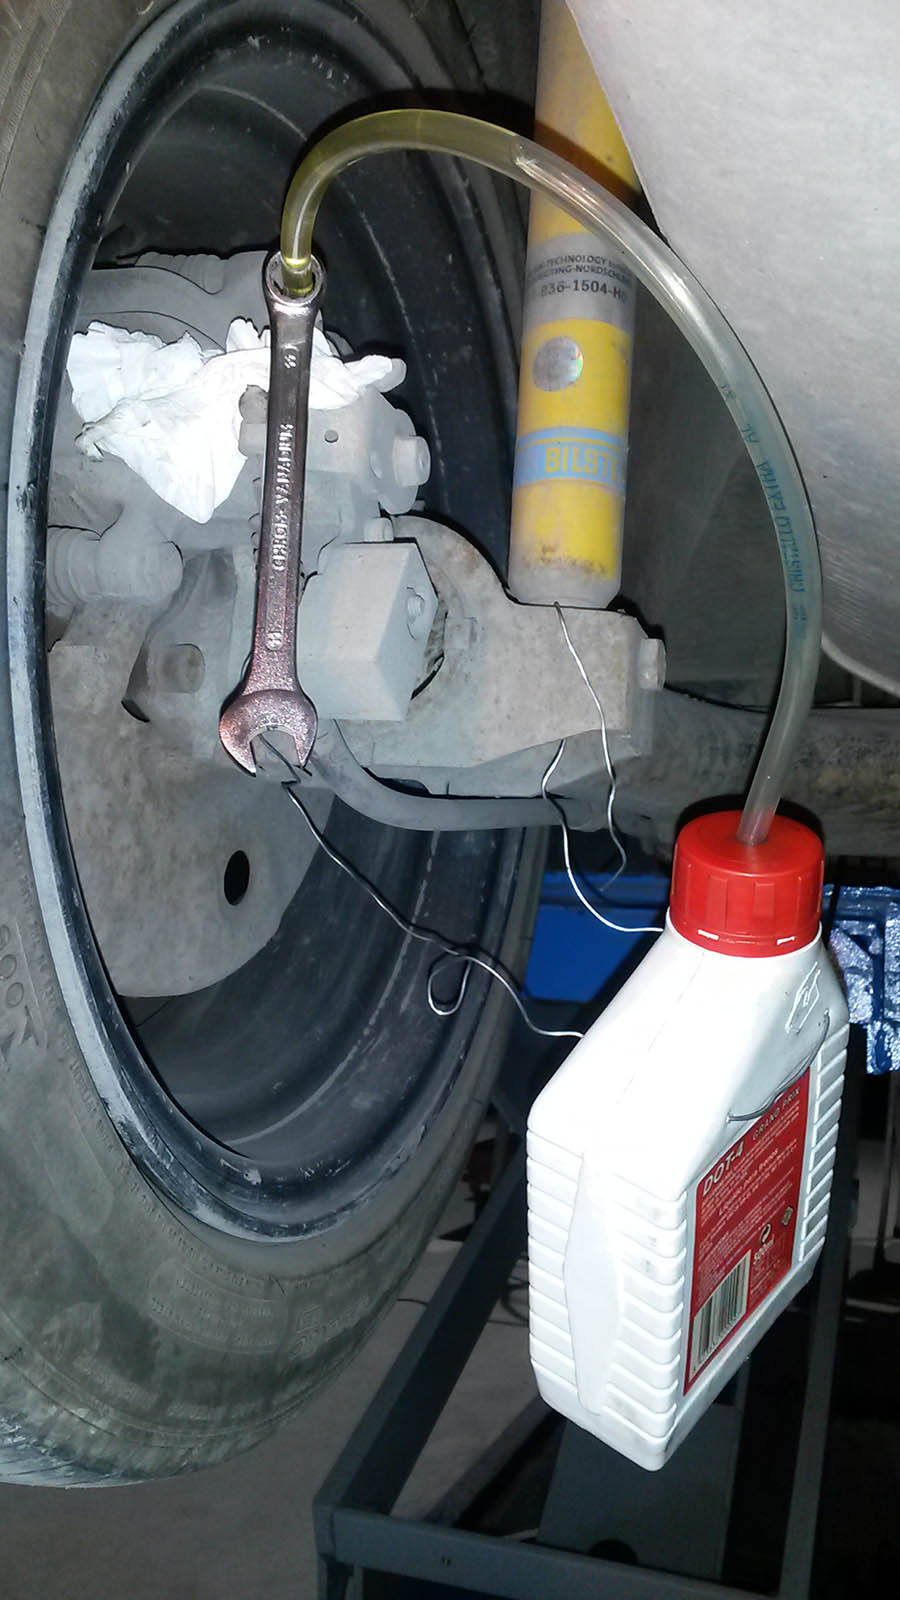 2L Purgador de Frenos de Aire de Autom/óvil Herramientas de Extracci/ón del L/íquido de Frenos Kit de Cambiando de L/íquido de Purga de Frenos de Coche